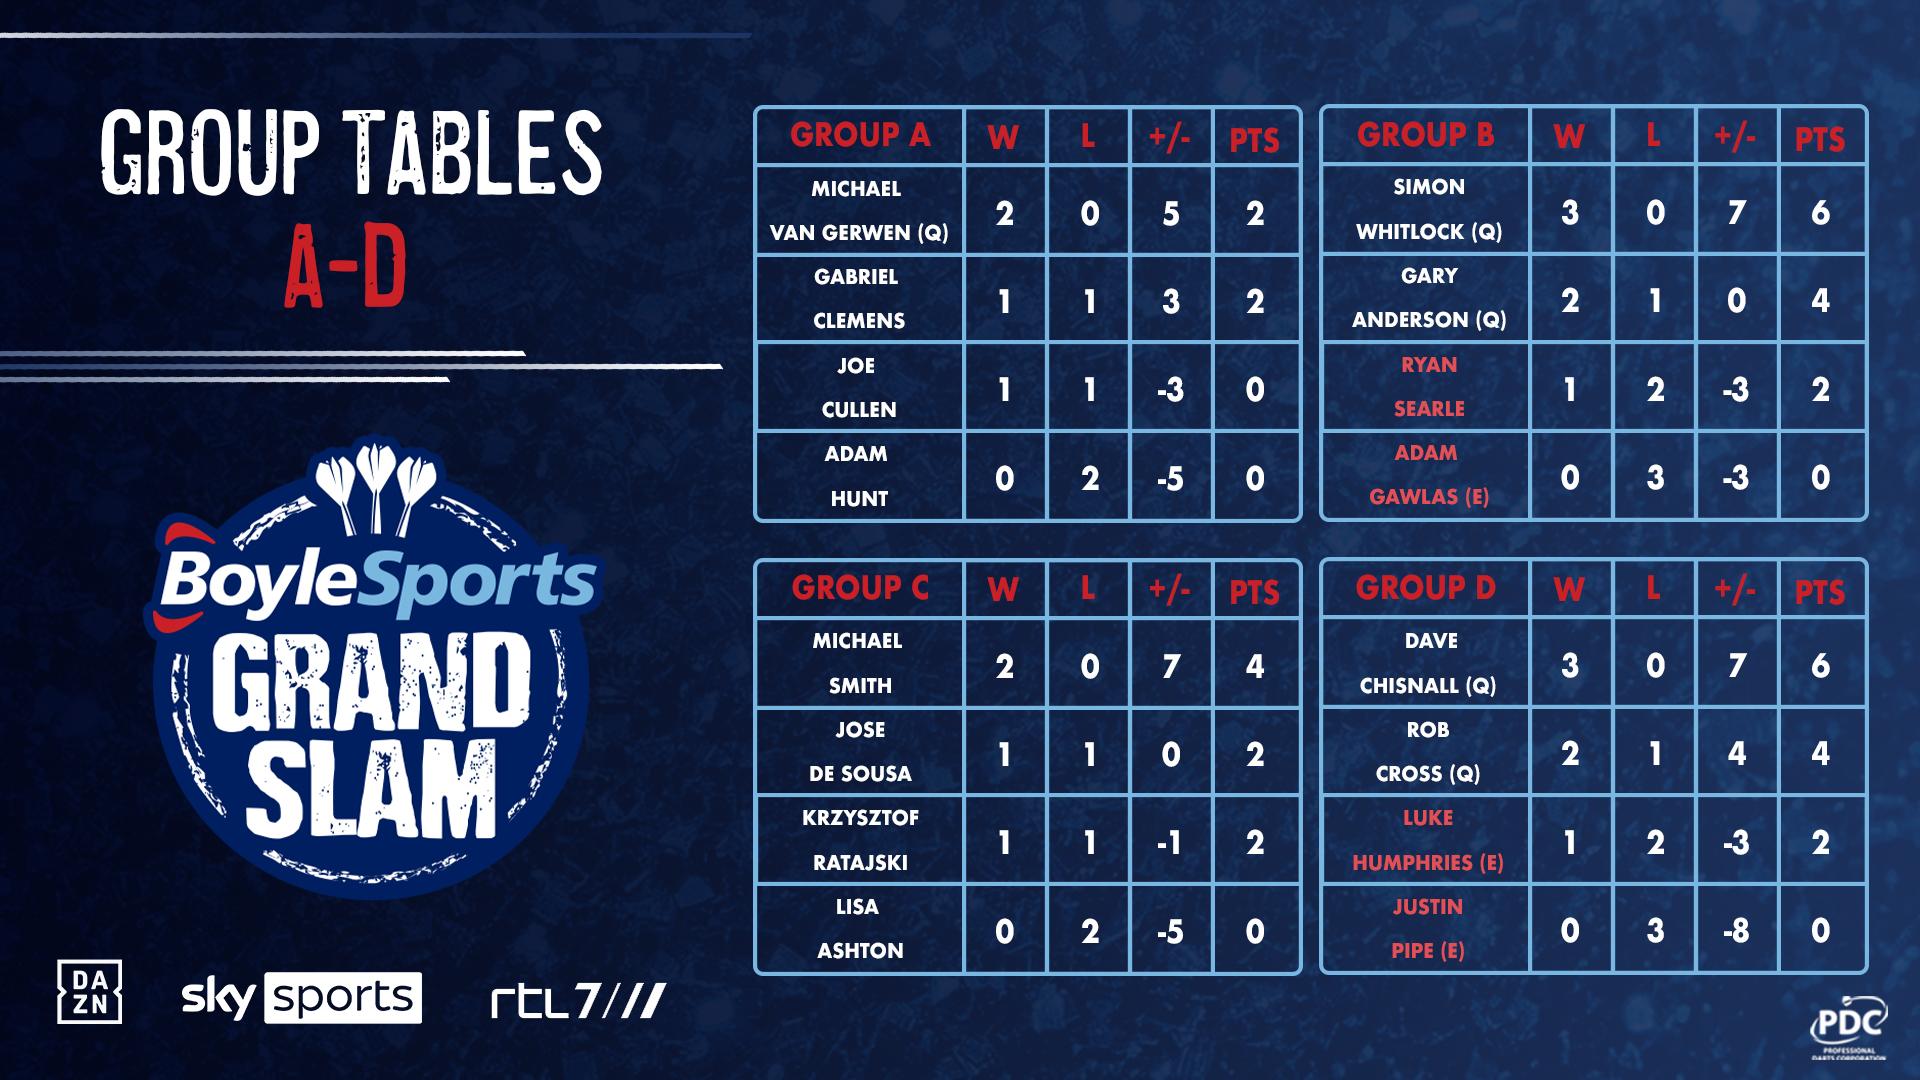 BoyleSports Grand Slam Tables